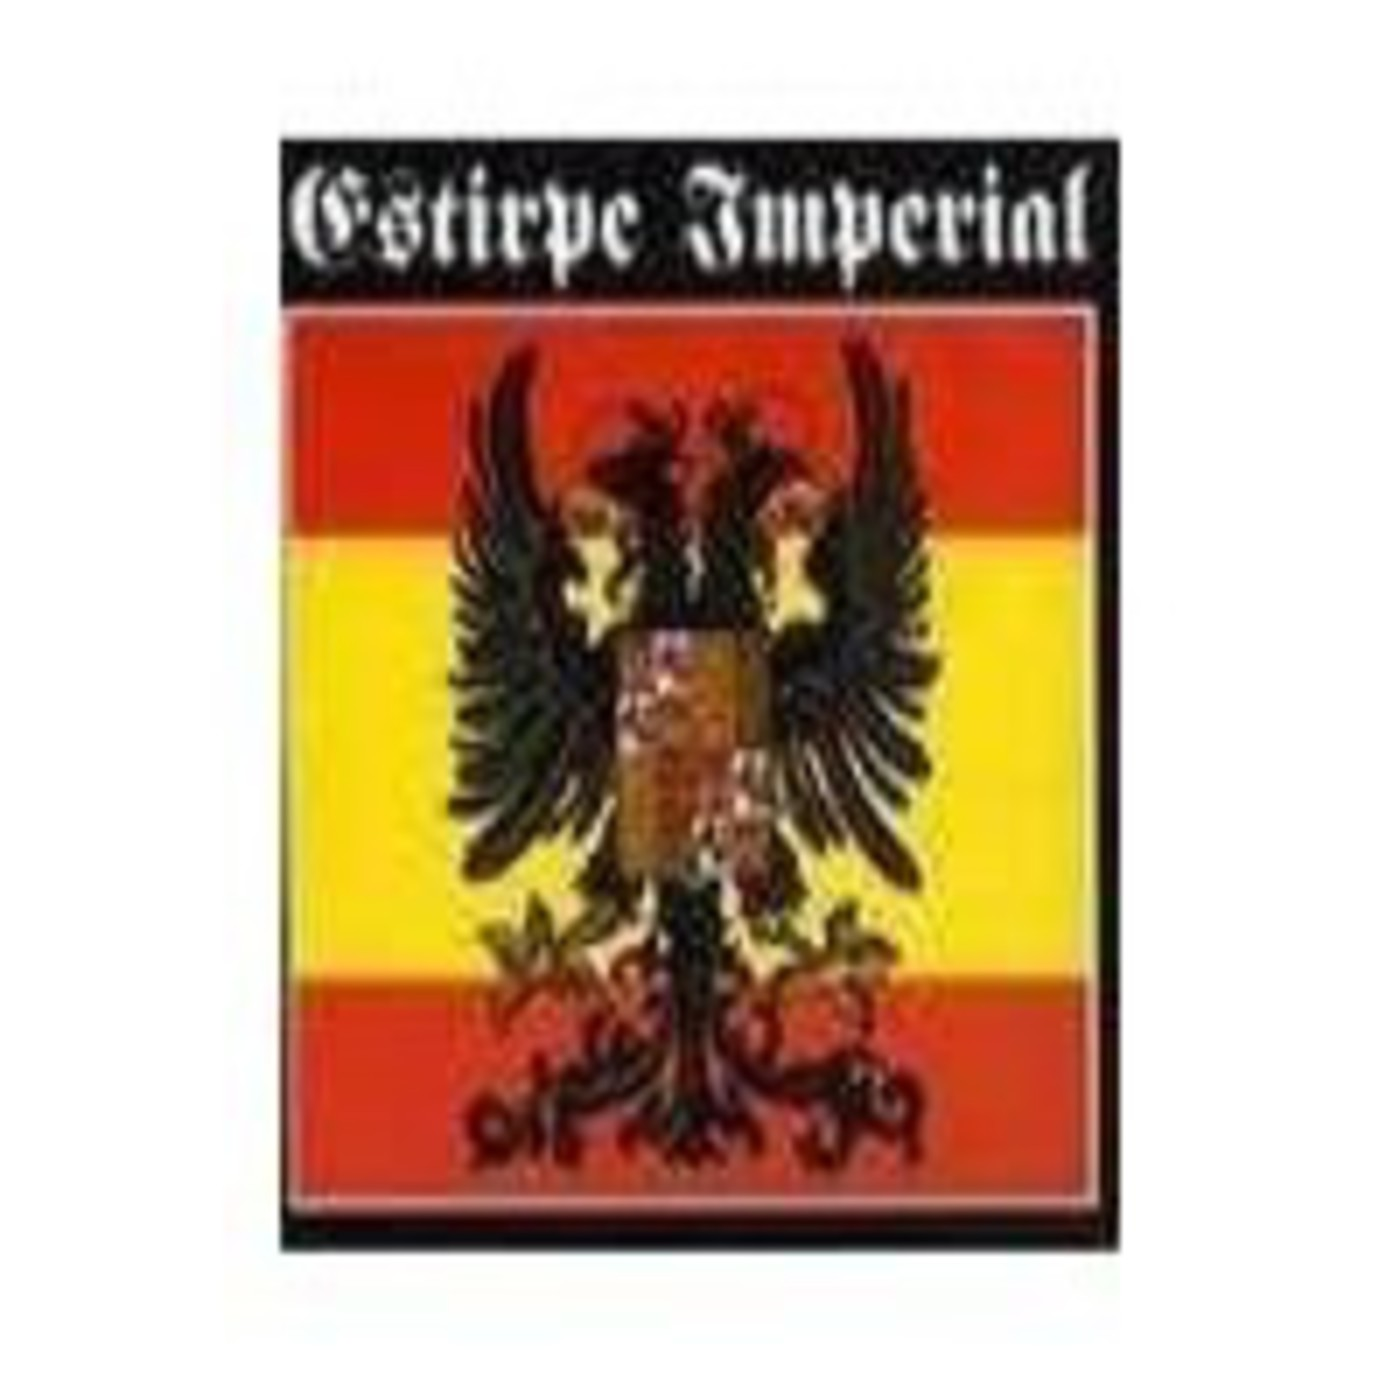 Homenaje a mi bandera - Estirpe imperial